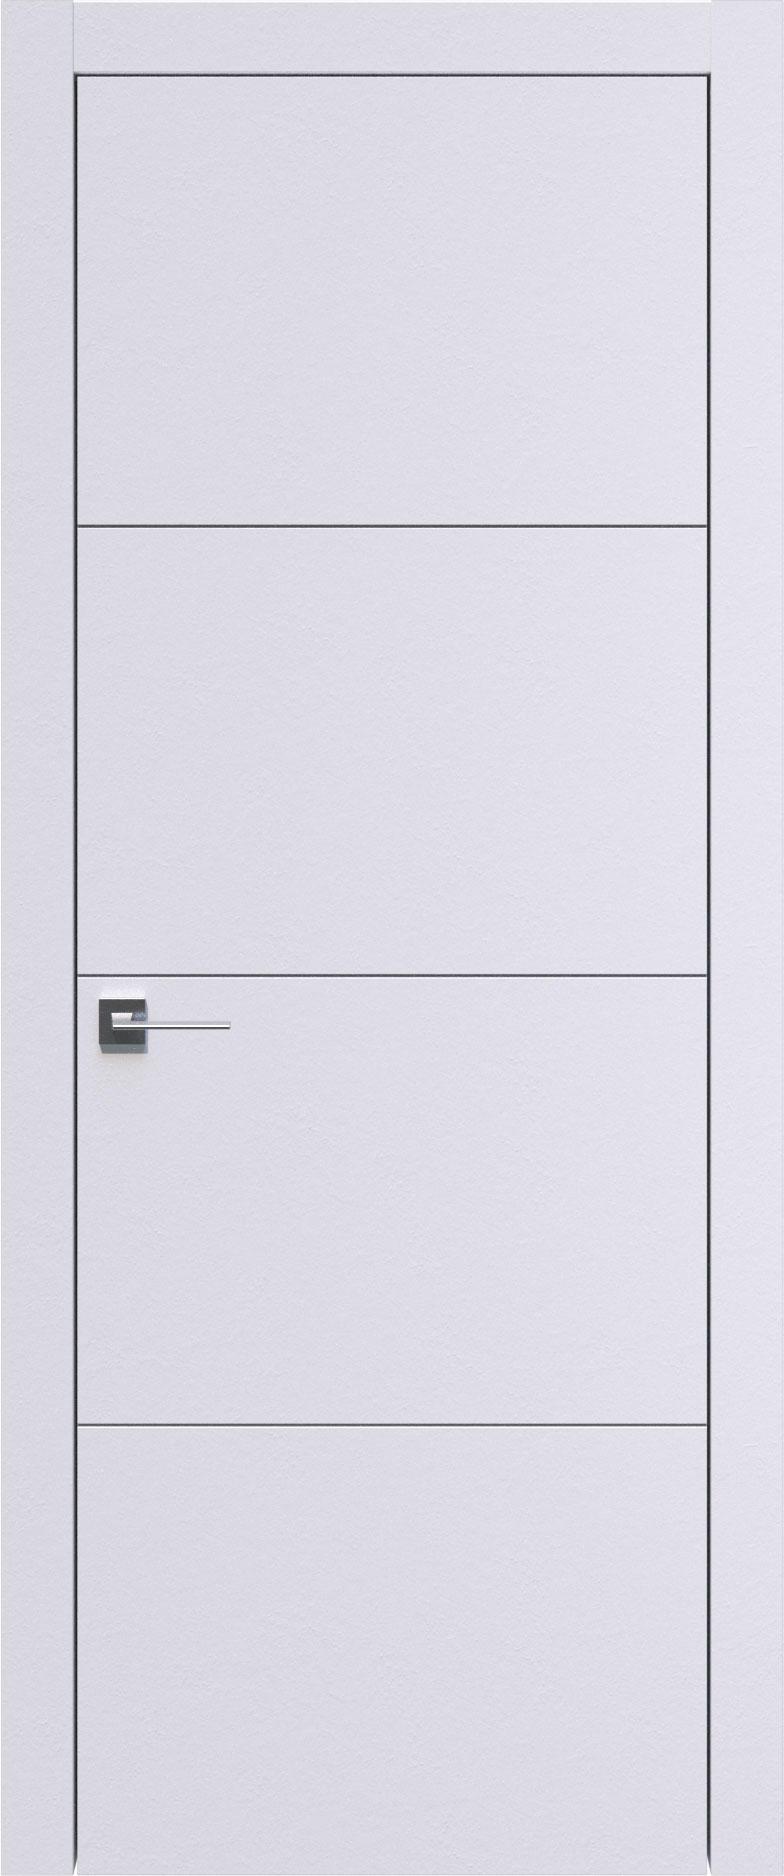 Tivoli Г-3 цвет - Арктик белый Без стекла (ДГ)